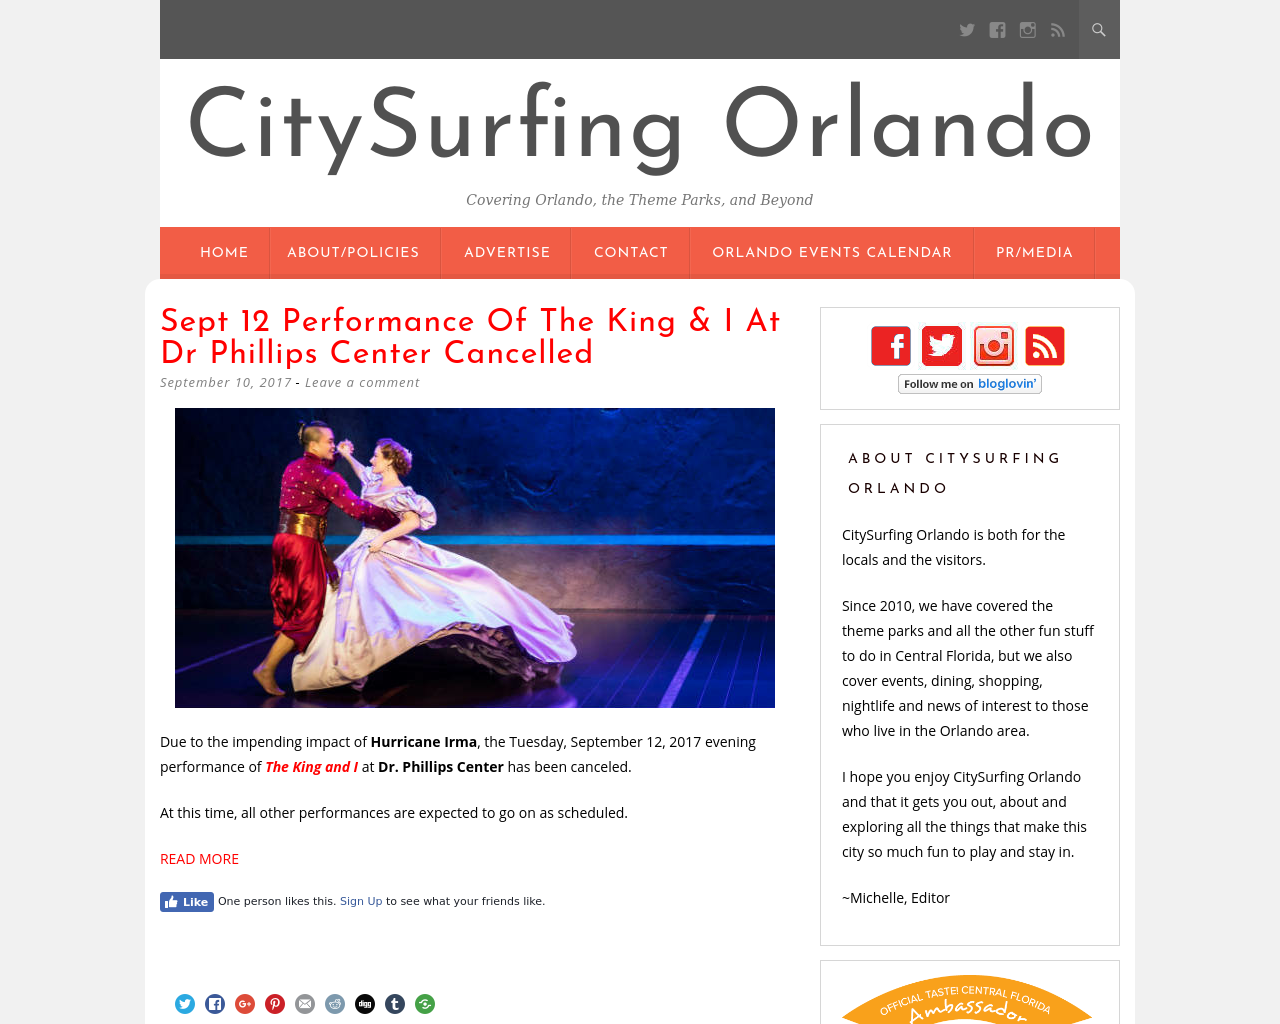 CitySurfing-Orlando-Advertising-Reviews-Pricing